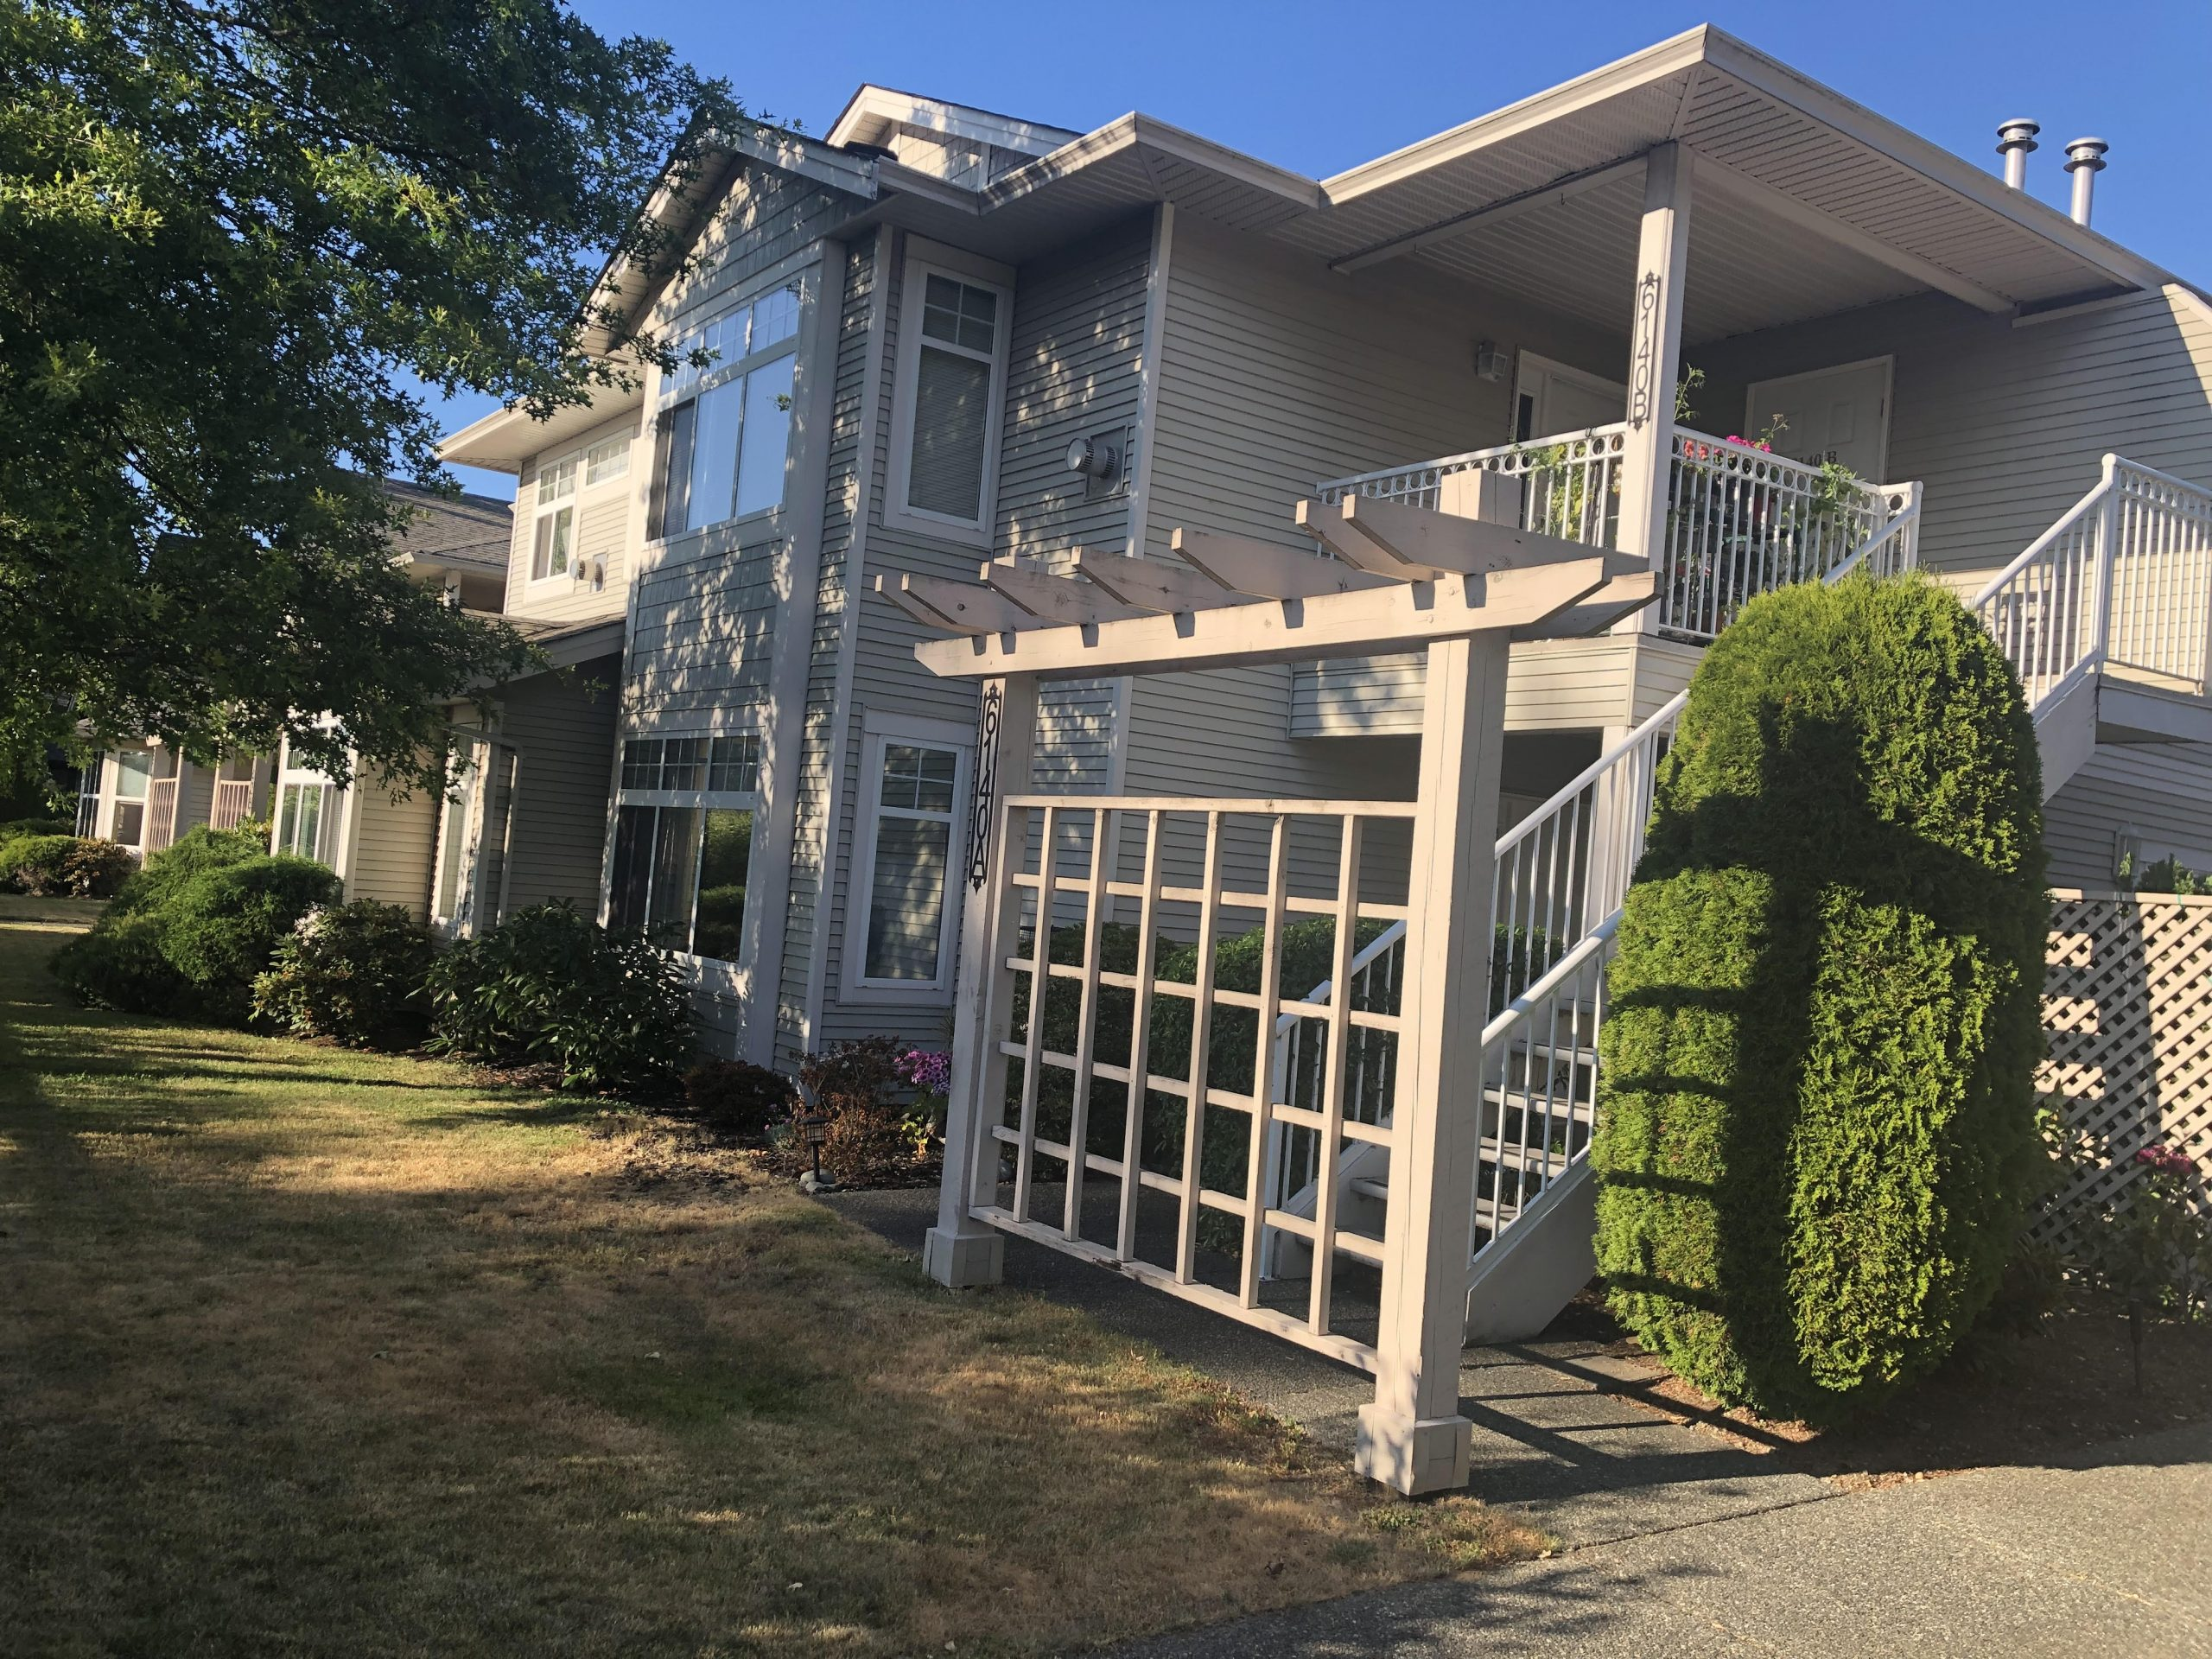 Nanaimo学区房 - 最新上市!最新推出纳奈莫北区重点中学Dover Bay附近精美Townhouse